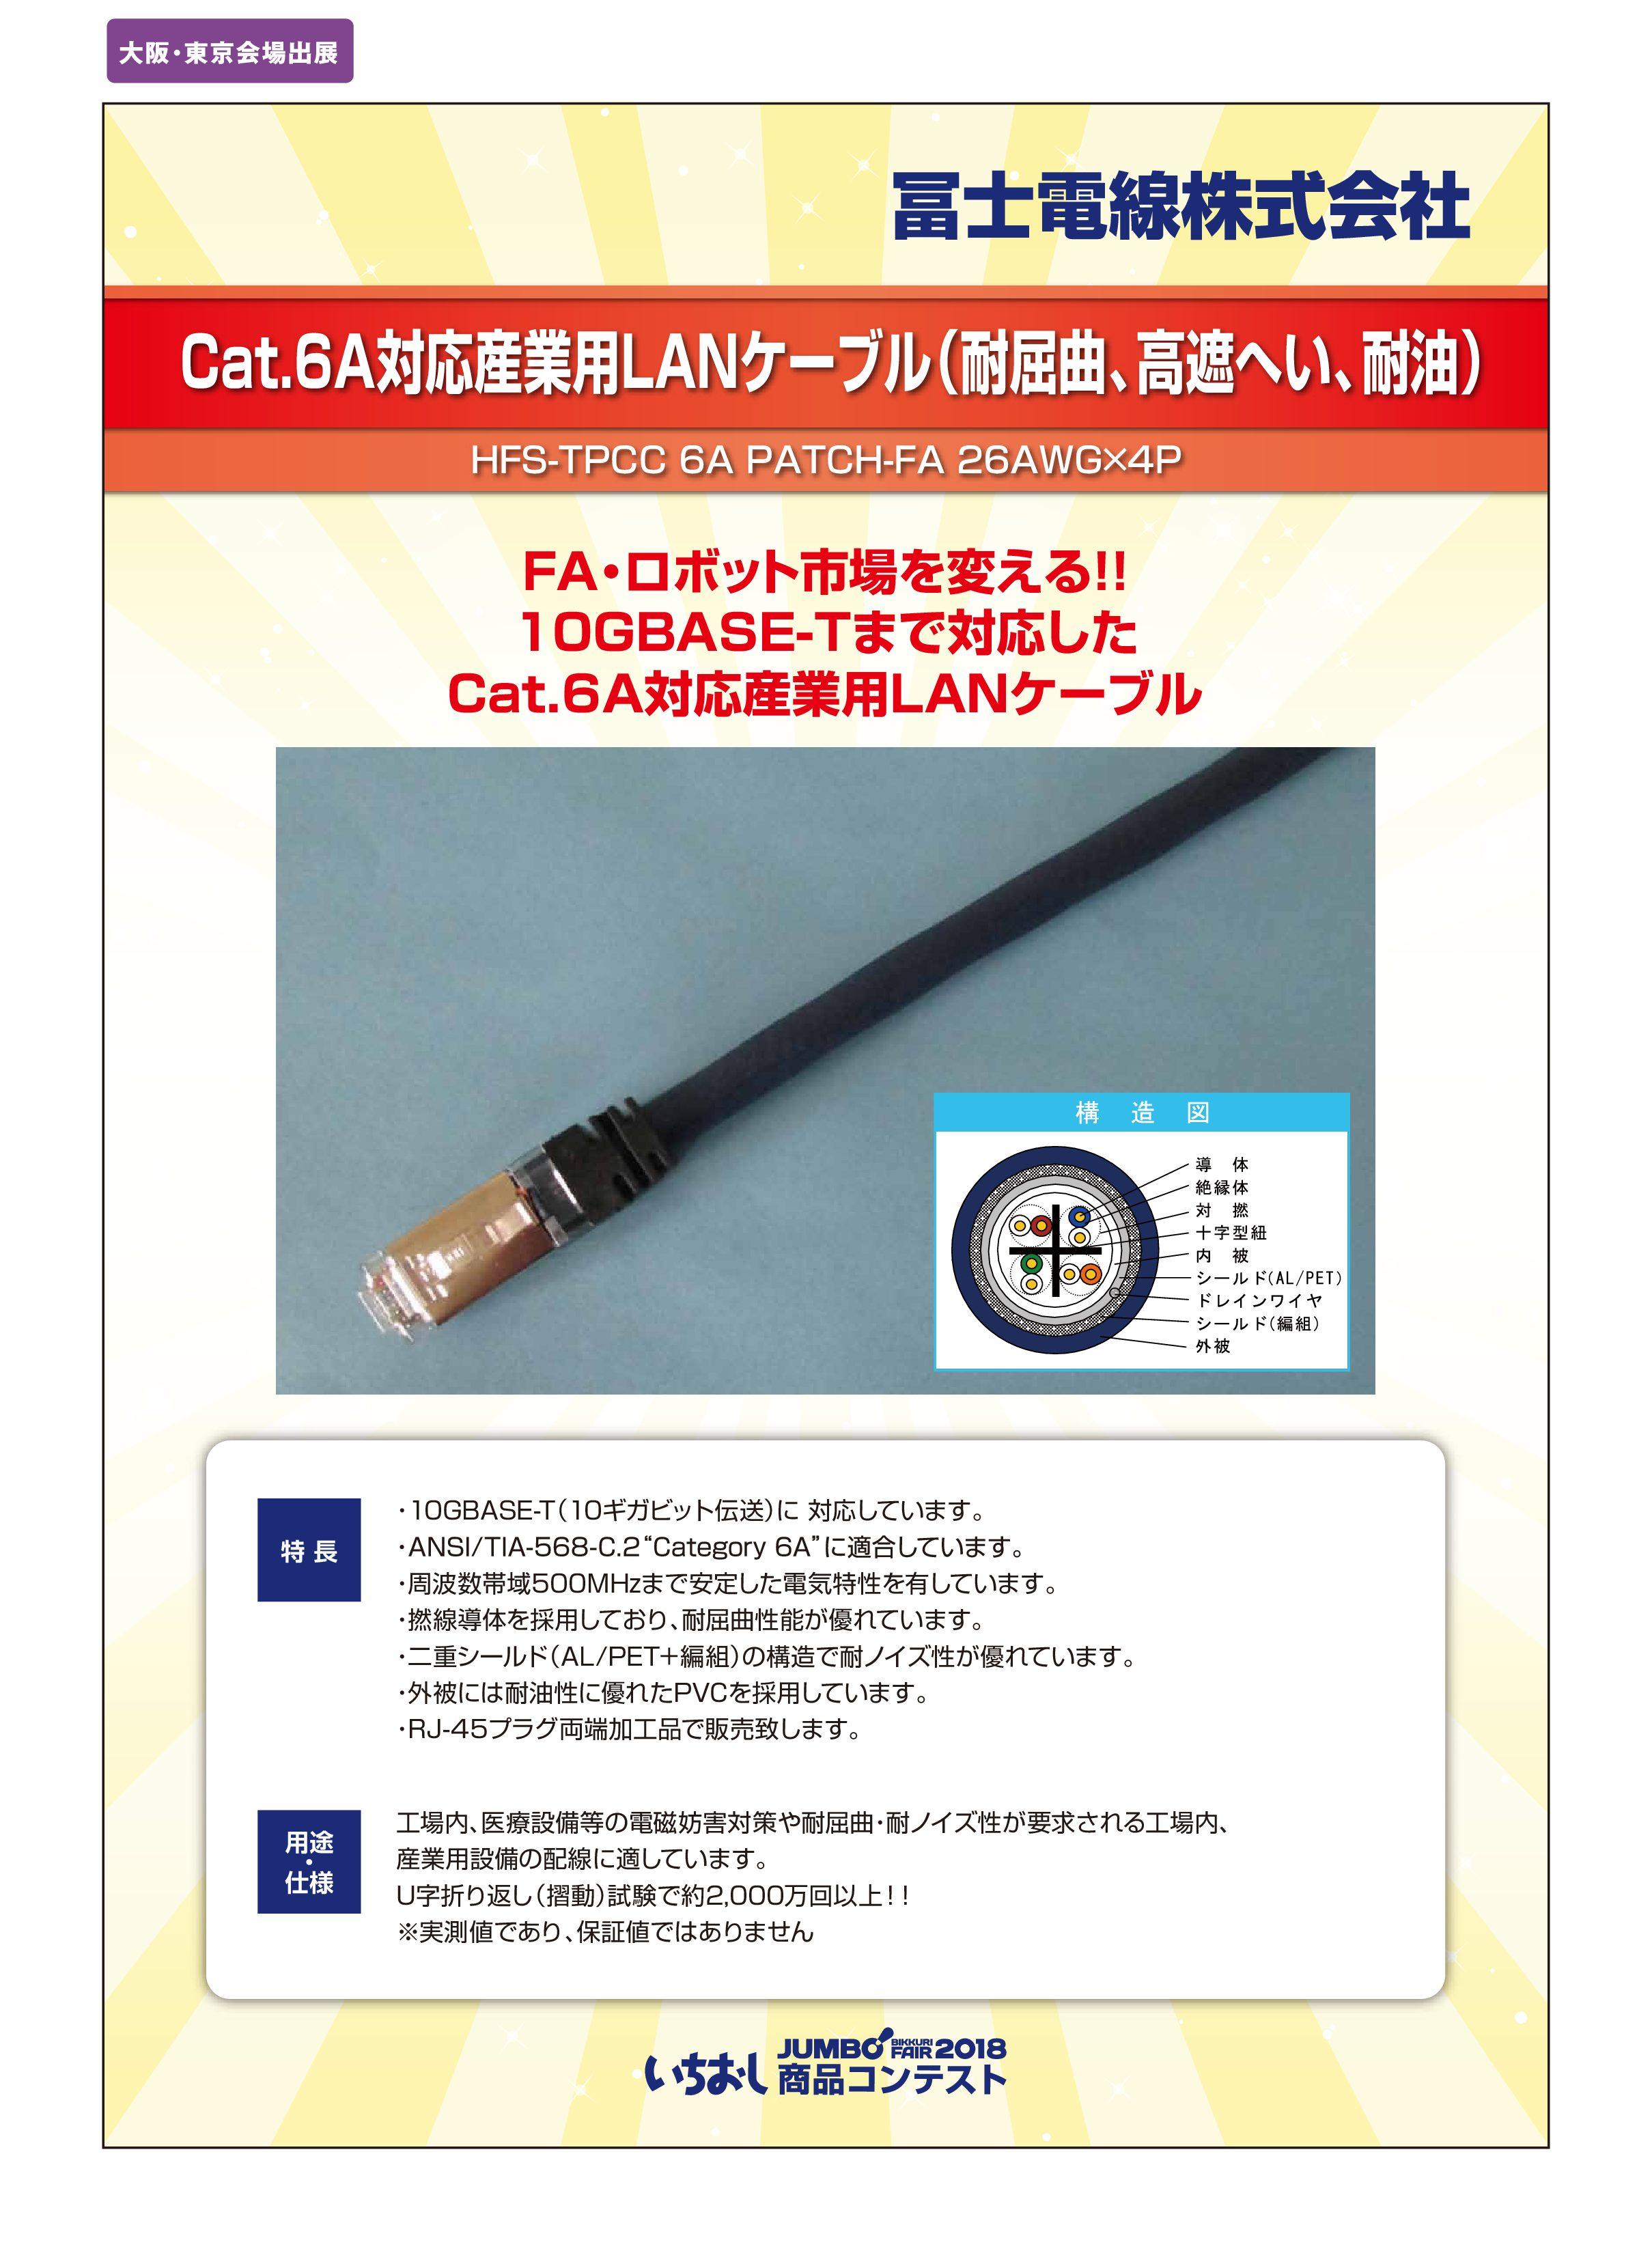 「Cat.6A対応産業用LANケーブル(耐屈曲、高遮へい、耐油)」冨士電線株式会社の画像